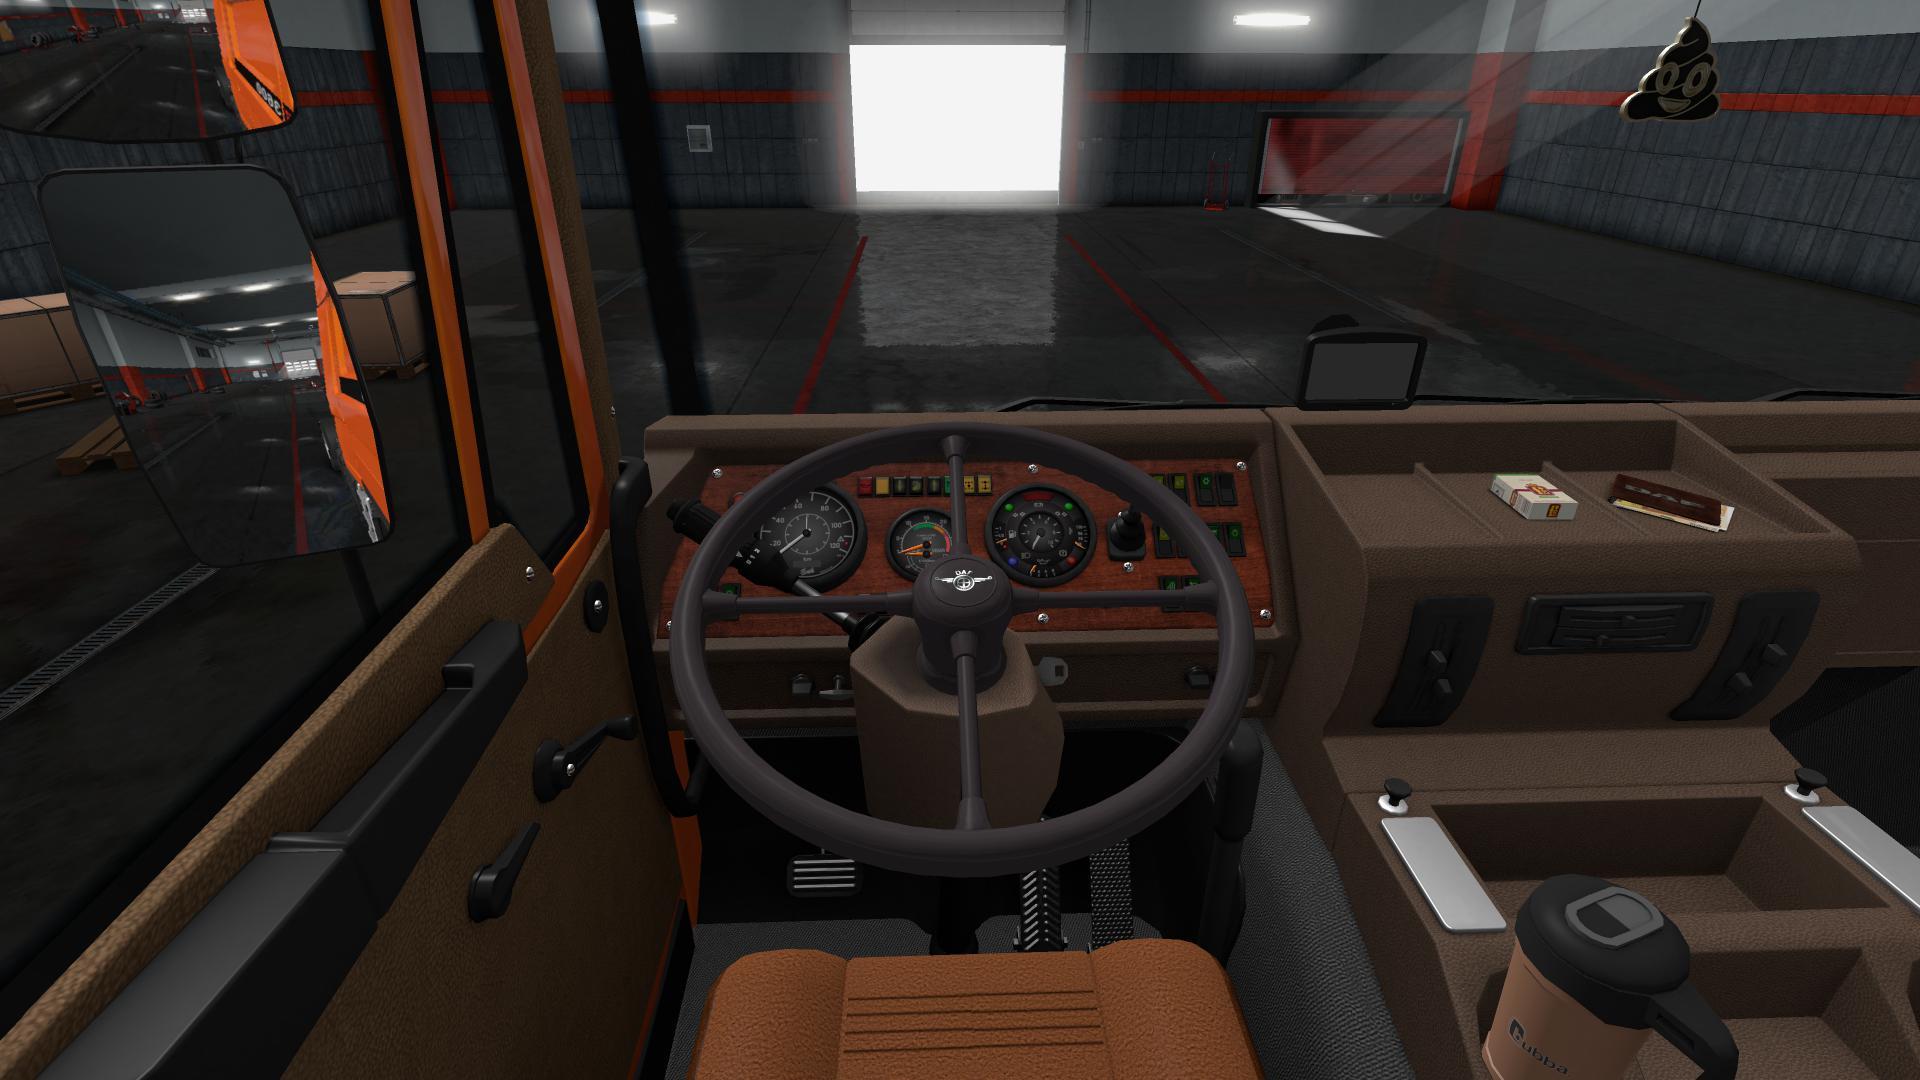 Ets2 Mods Steering Wheel, Steering Wheel Addon For Daf F 1 33 X Ets2 Mods Euro Truck Simulator 2 Mods Ets2mods Lt, Ets2 Mods Steering Wheel